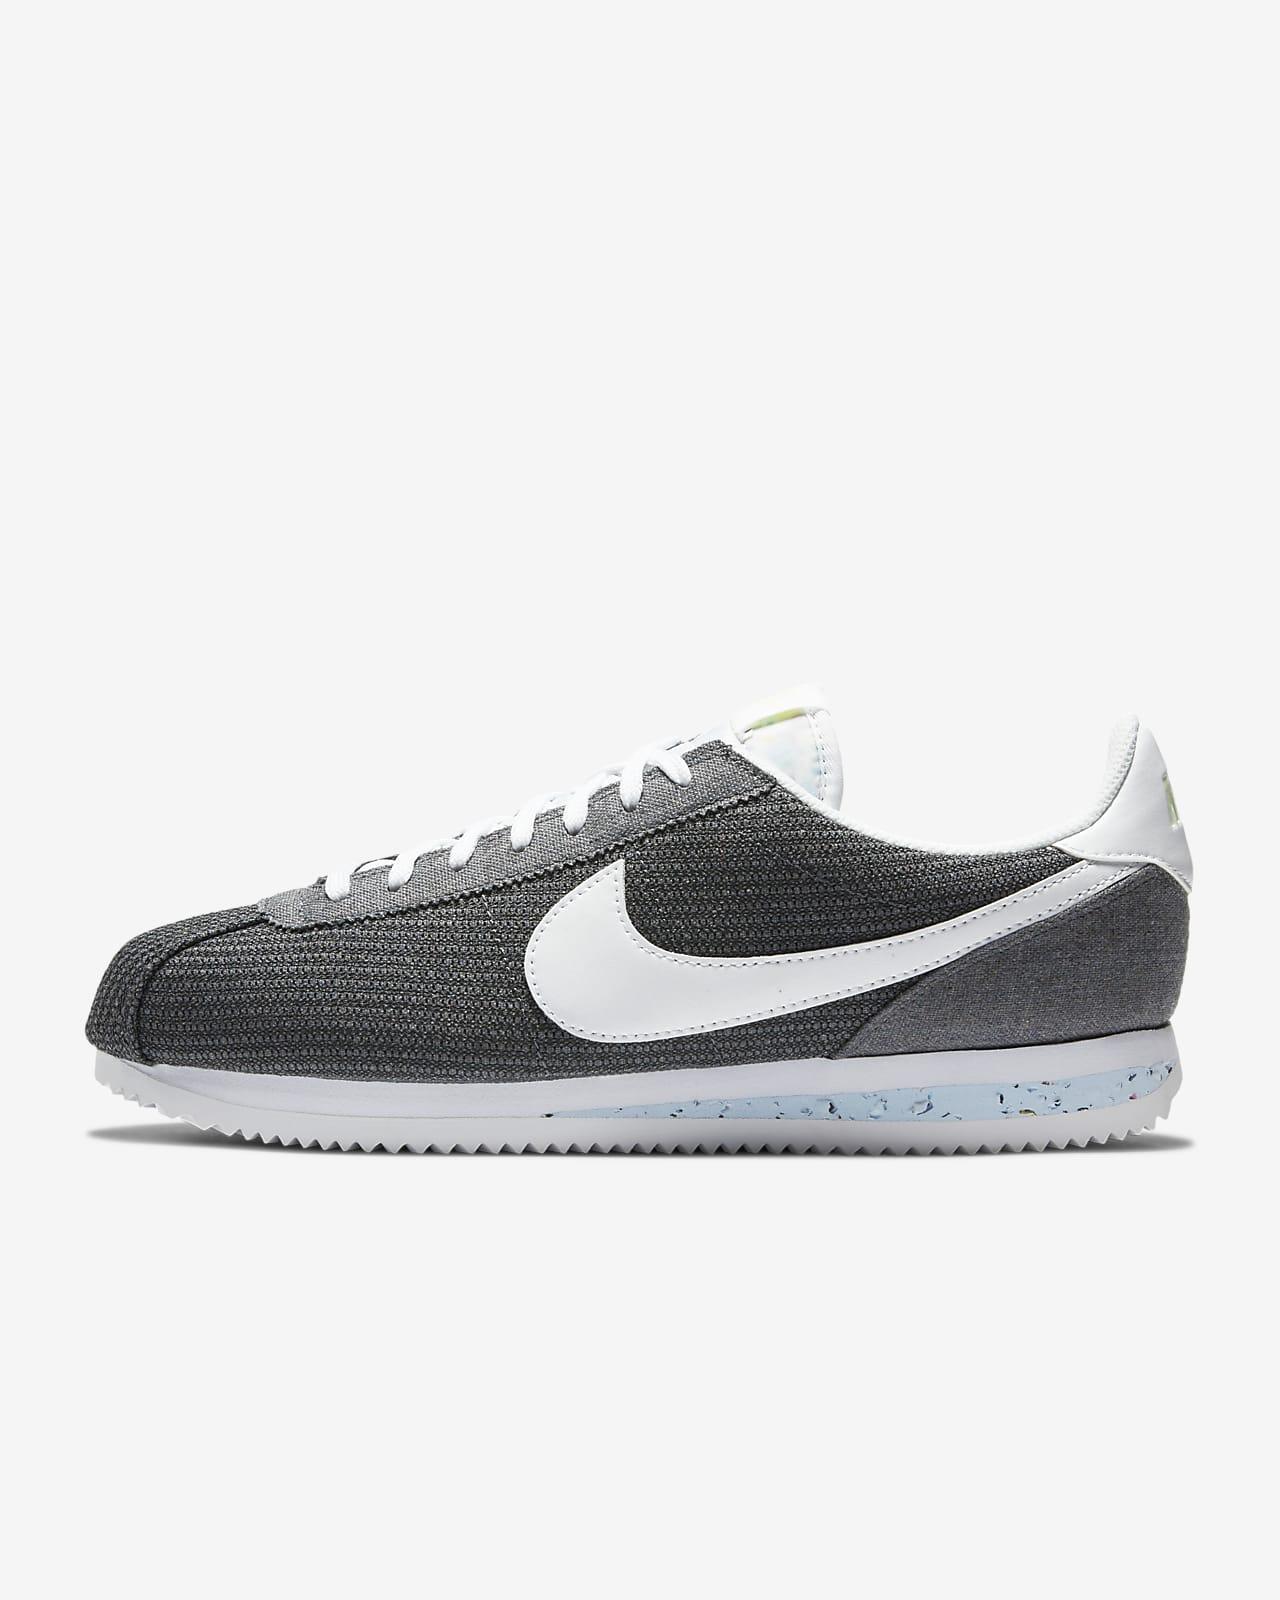 Nike Cortez Basic Premium Men's Shoe